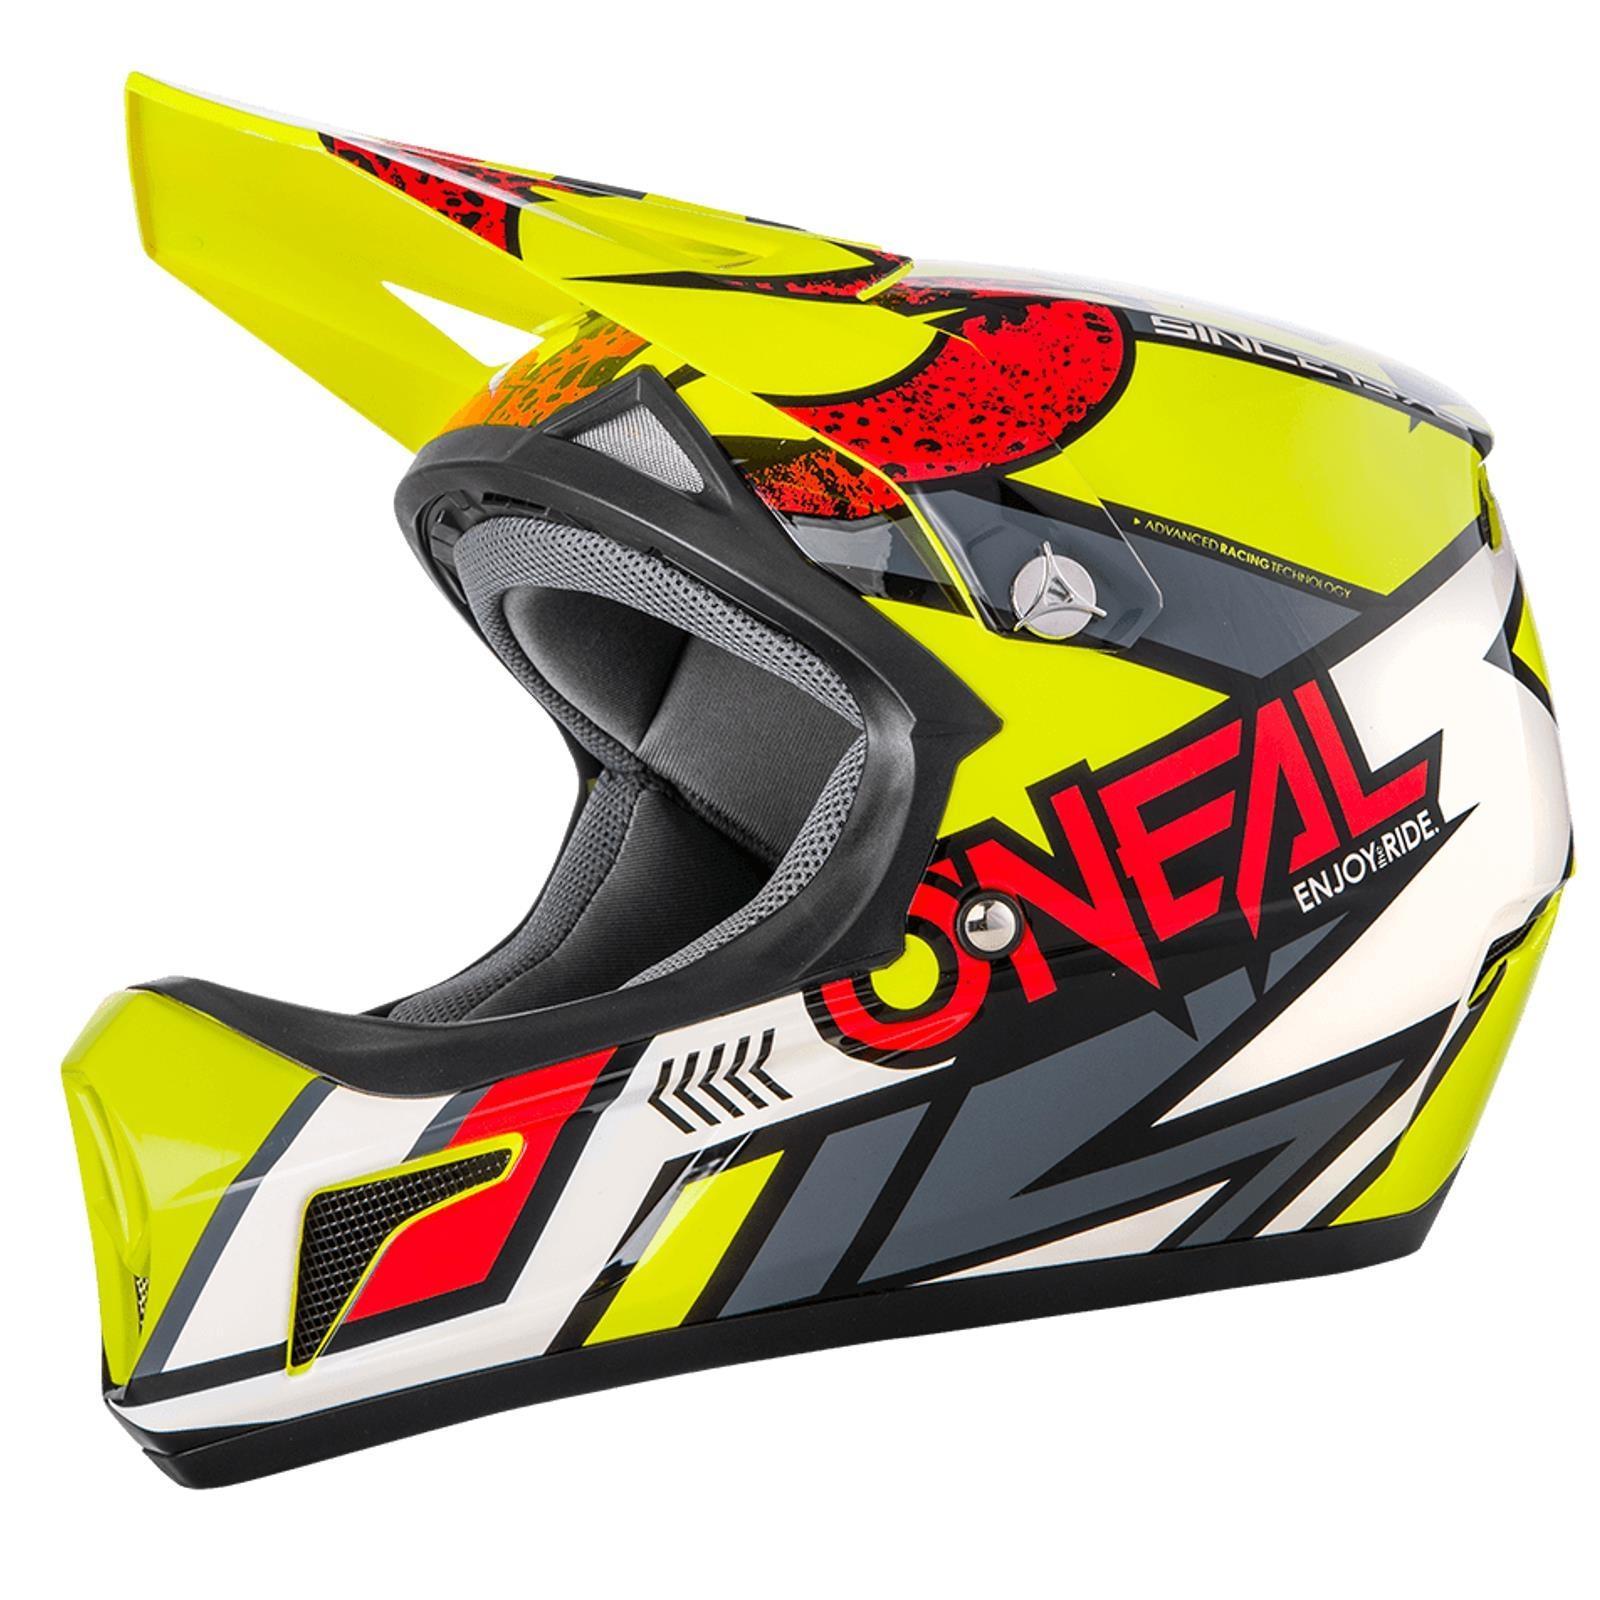 Indexbild 14 - ONeal-Sonus-Strike-Fahrrad-Helm-All-Mountain-Bike-MTB-Downhill-Fullface-Fidlock